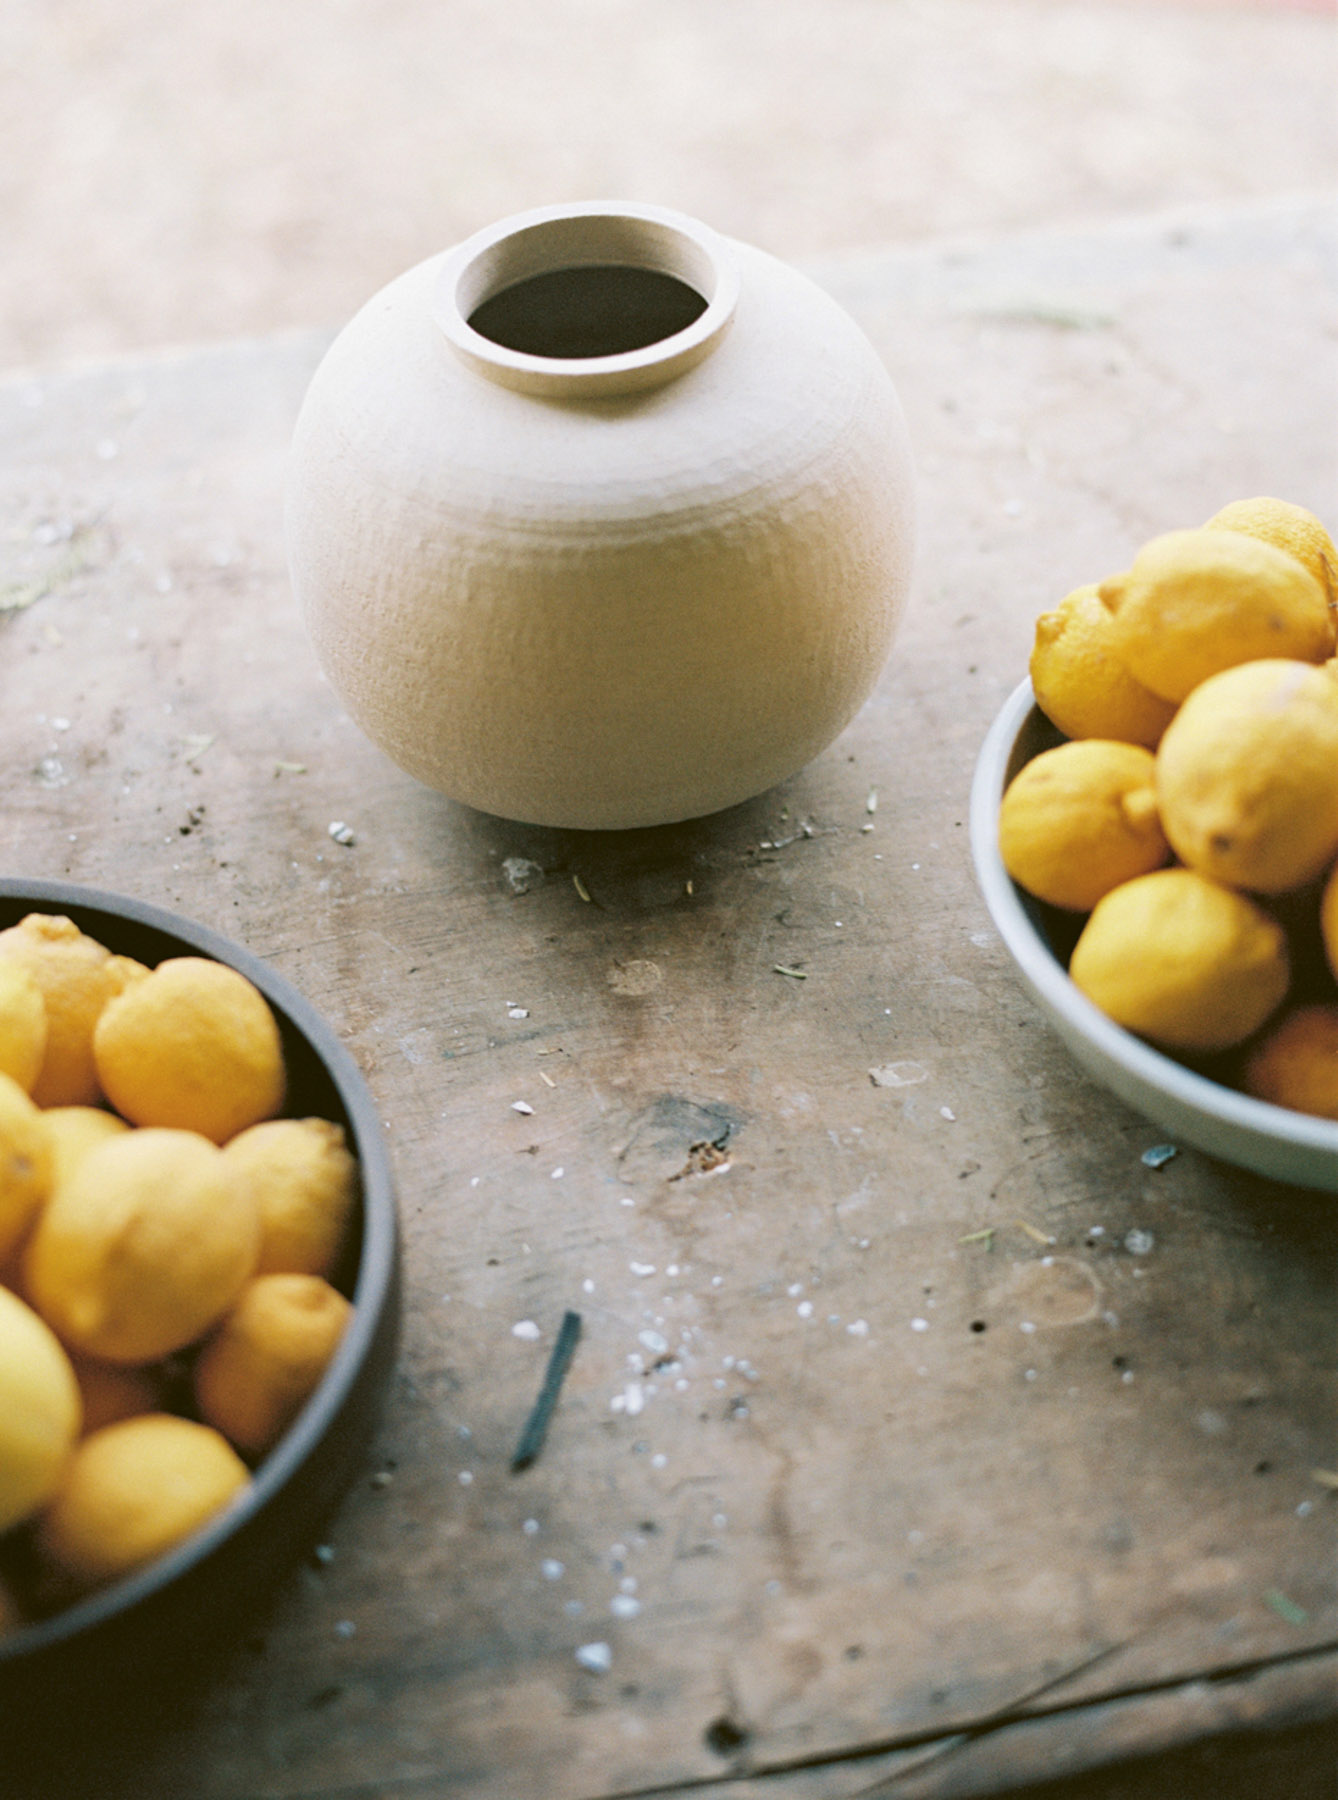 Miro Chun, Ceramicist, Arizona, Justin Chung